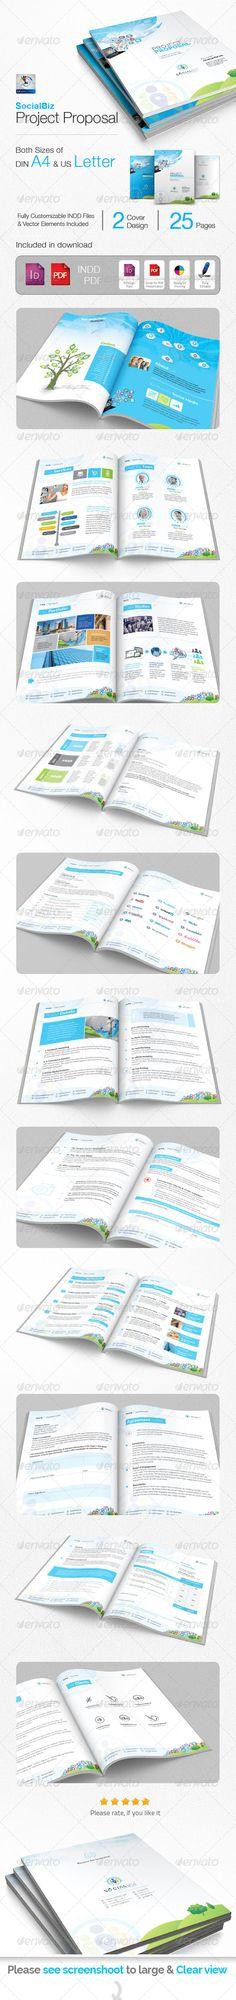 SocialBiz Social Media Proposal - Proposals & Invoices Stationery